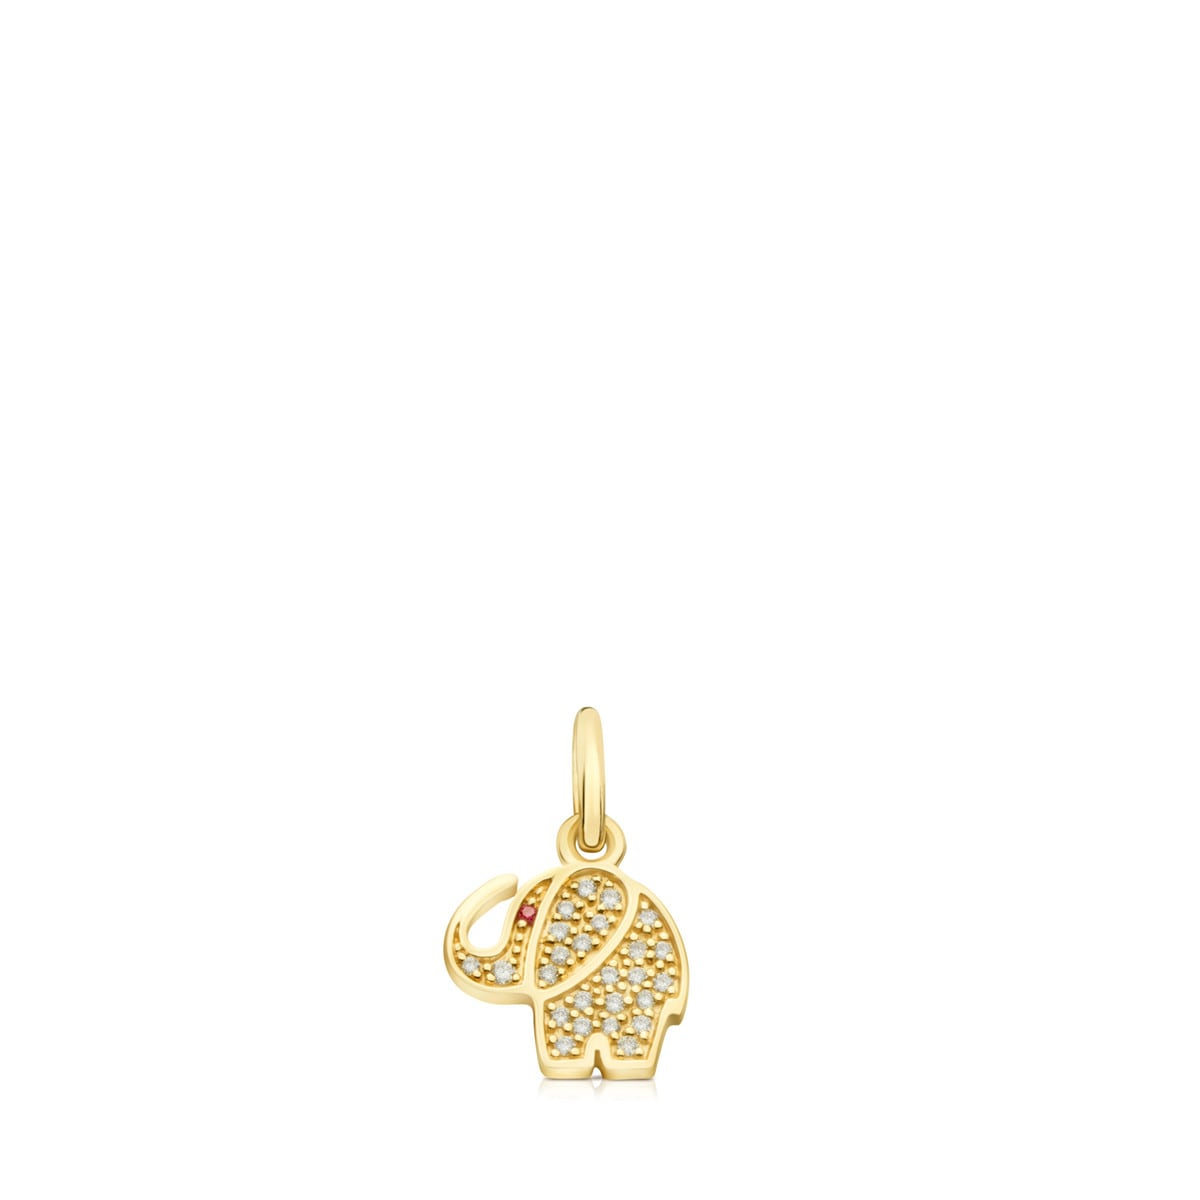 6db7e7ab1306 Dije Mi Talisman de Oro con Diamantes y Rubí - Tous Site MX